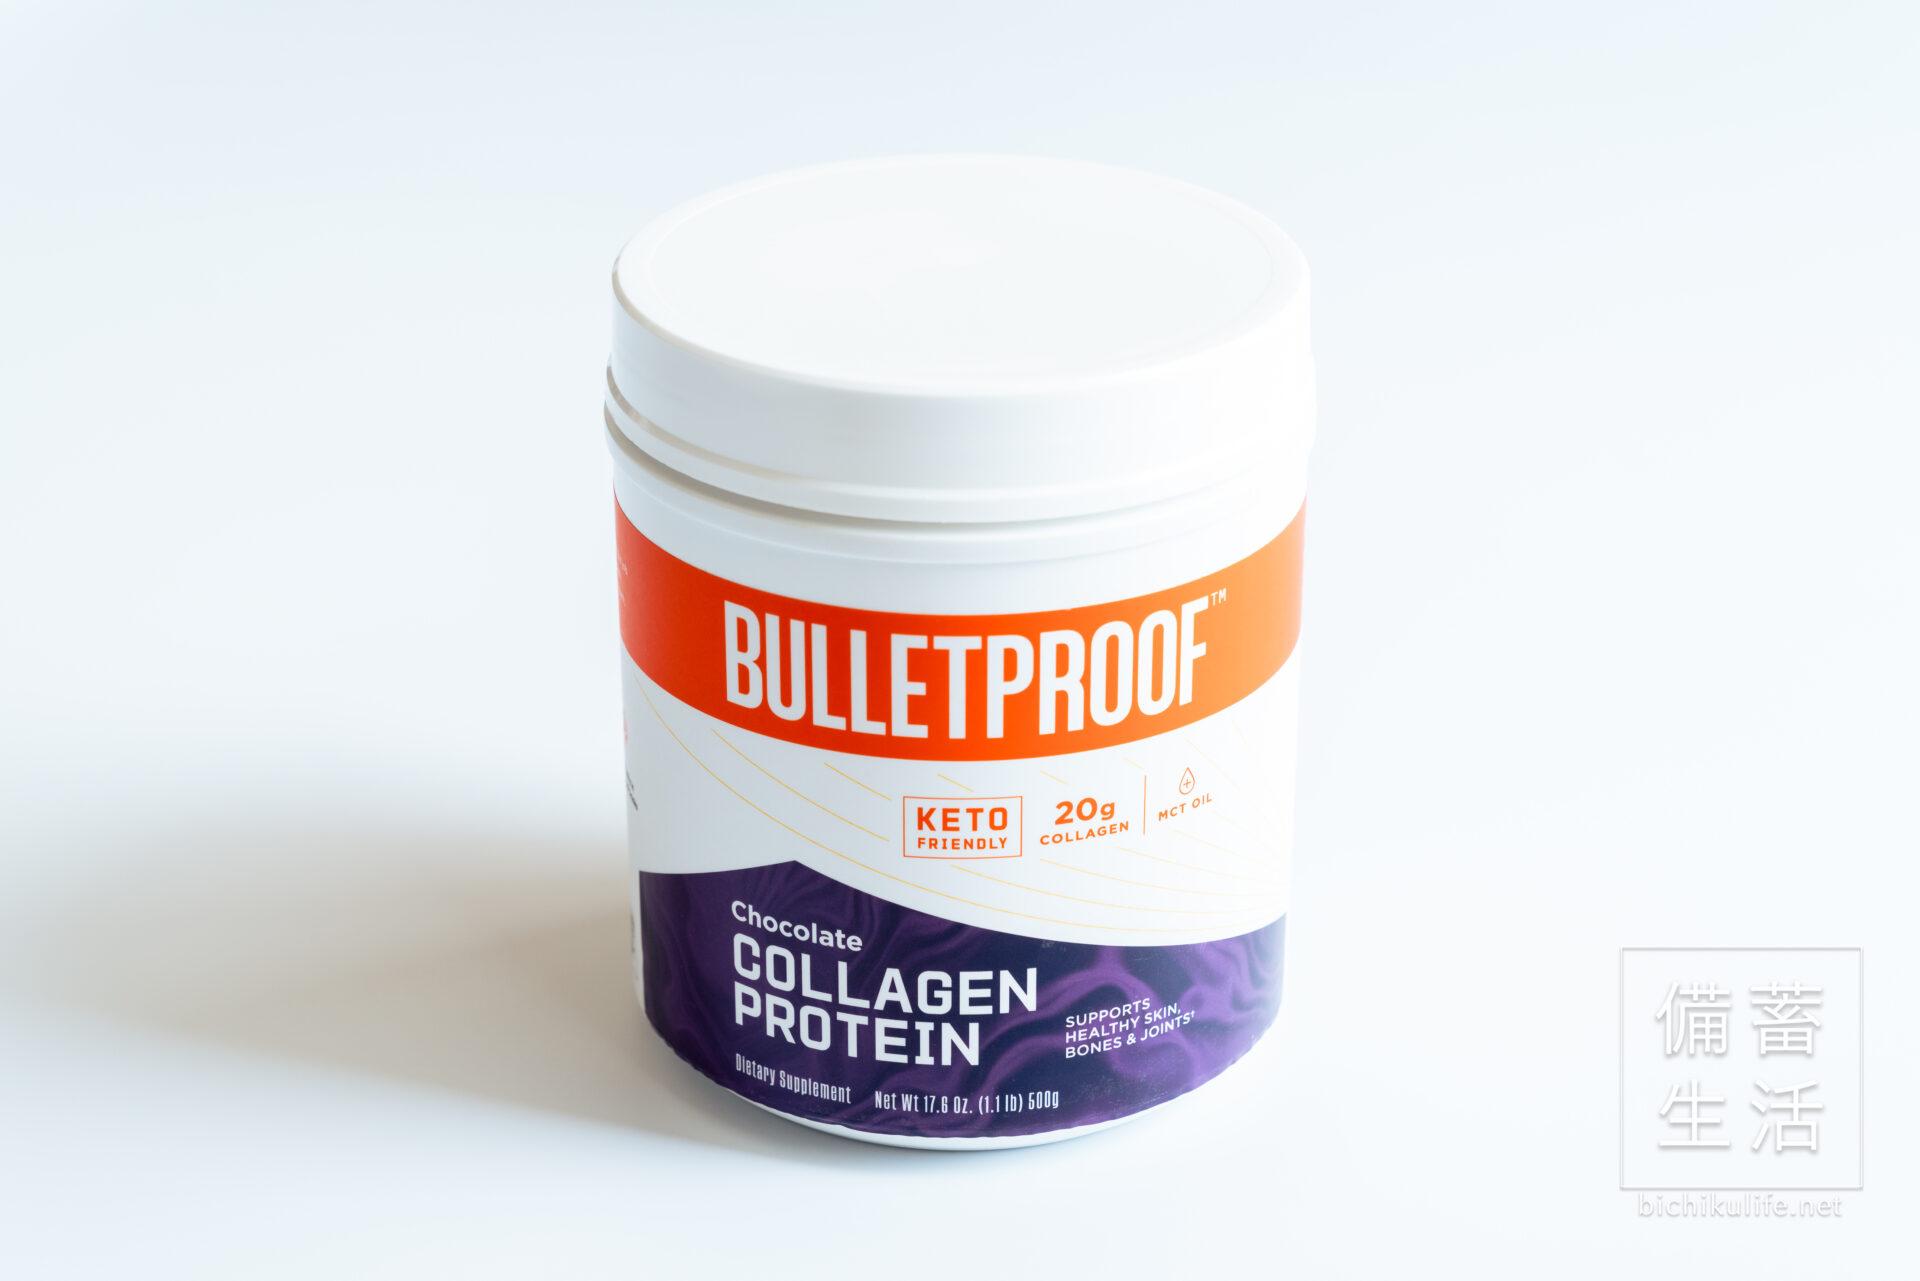 Bulletproofのプロテイン Chocolate